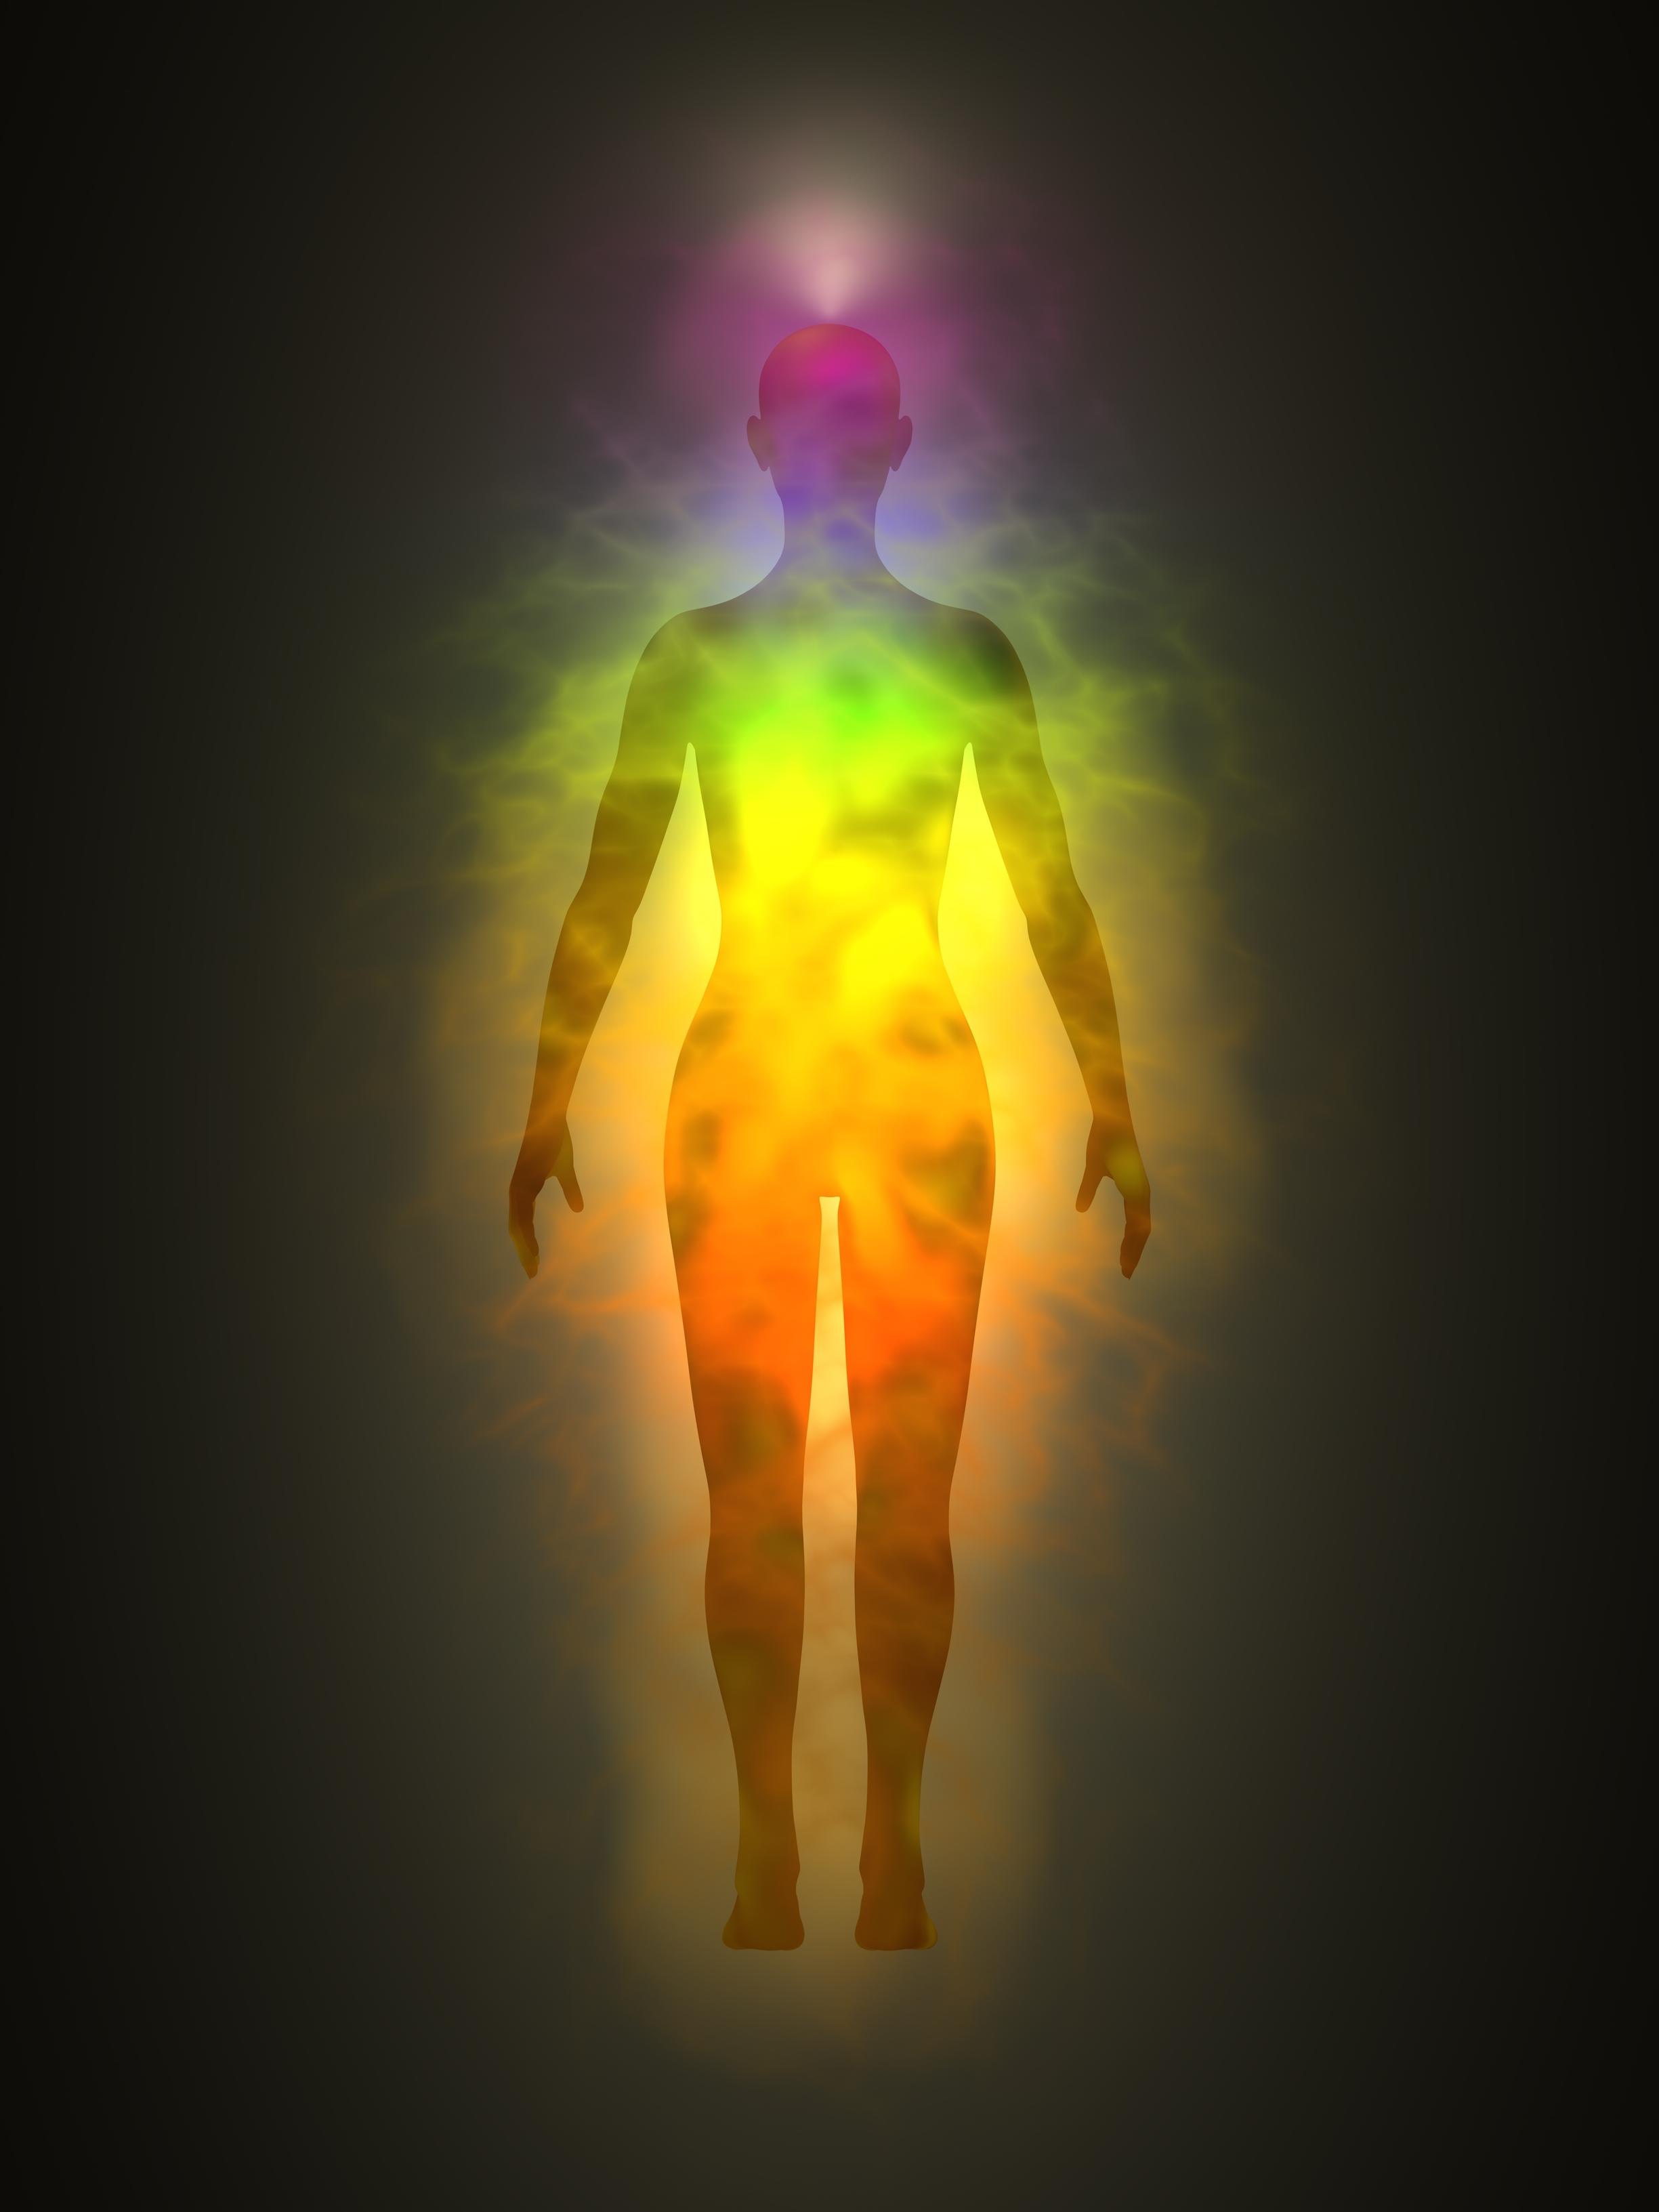 Billedresultat for kroppens energi